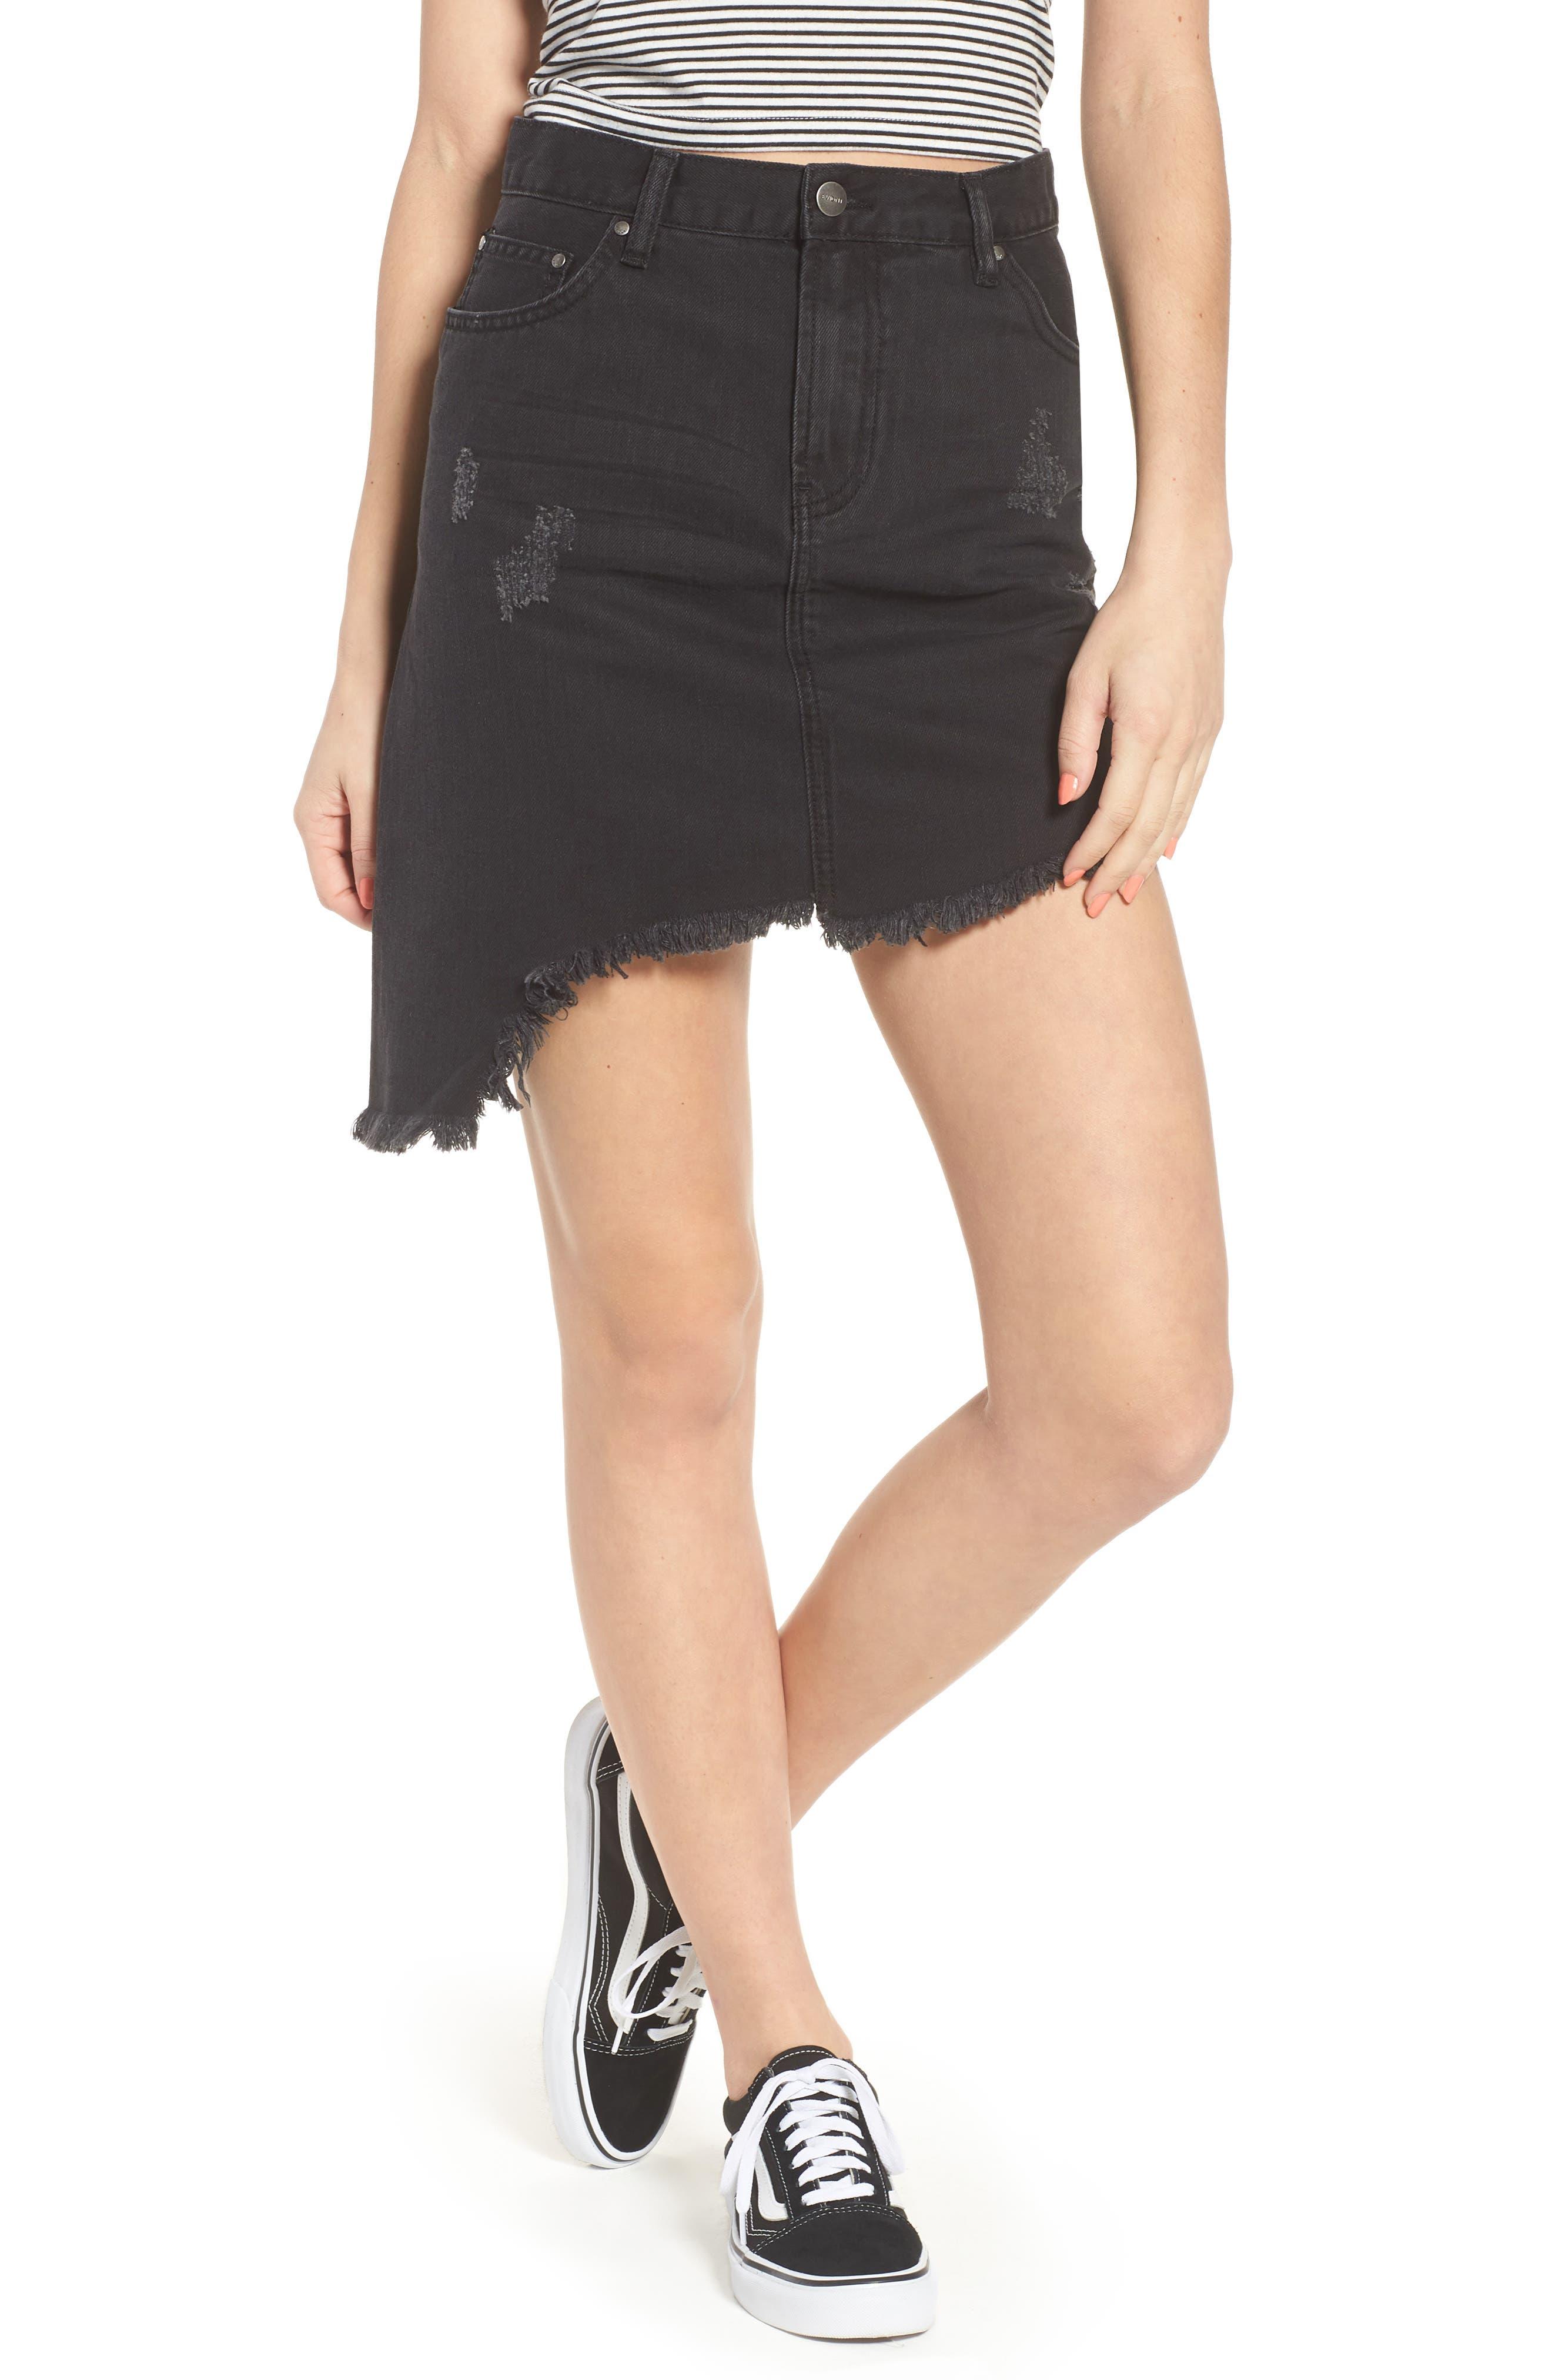 EVDNT Modena Asymmetrical Denim Skirt,                         Main,                         color, Black Sheep